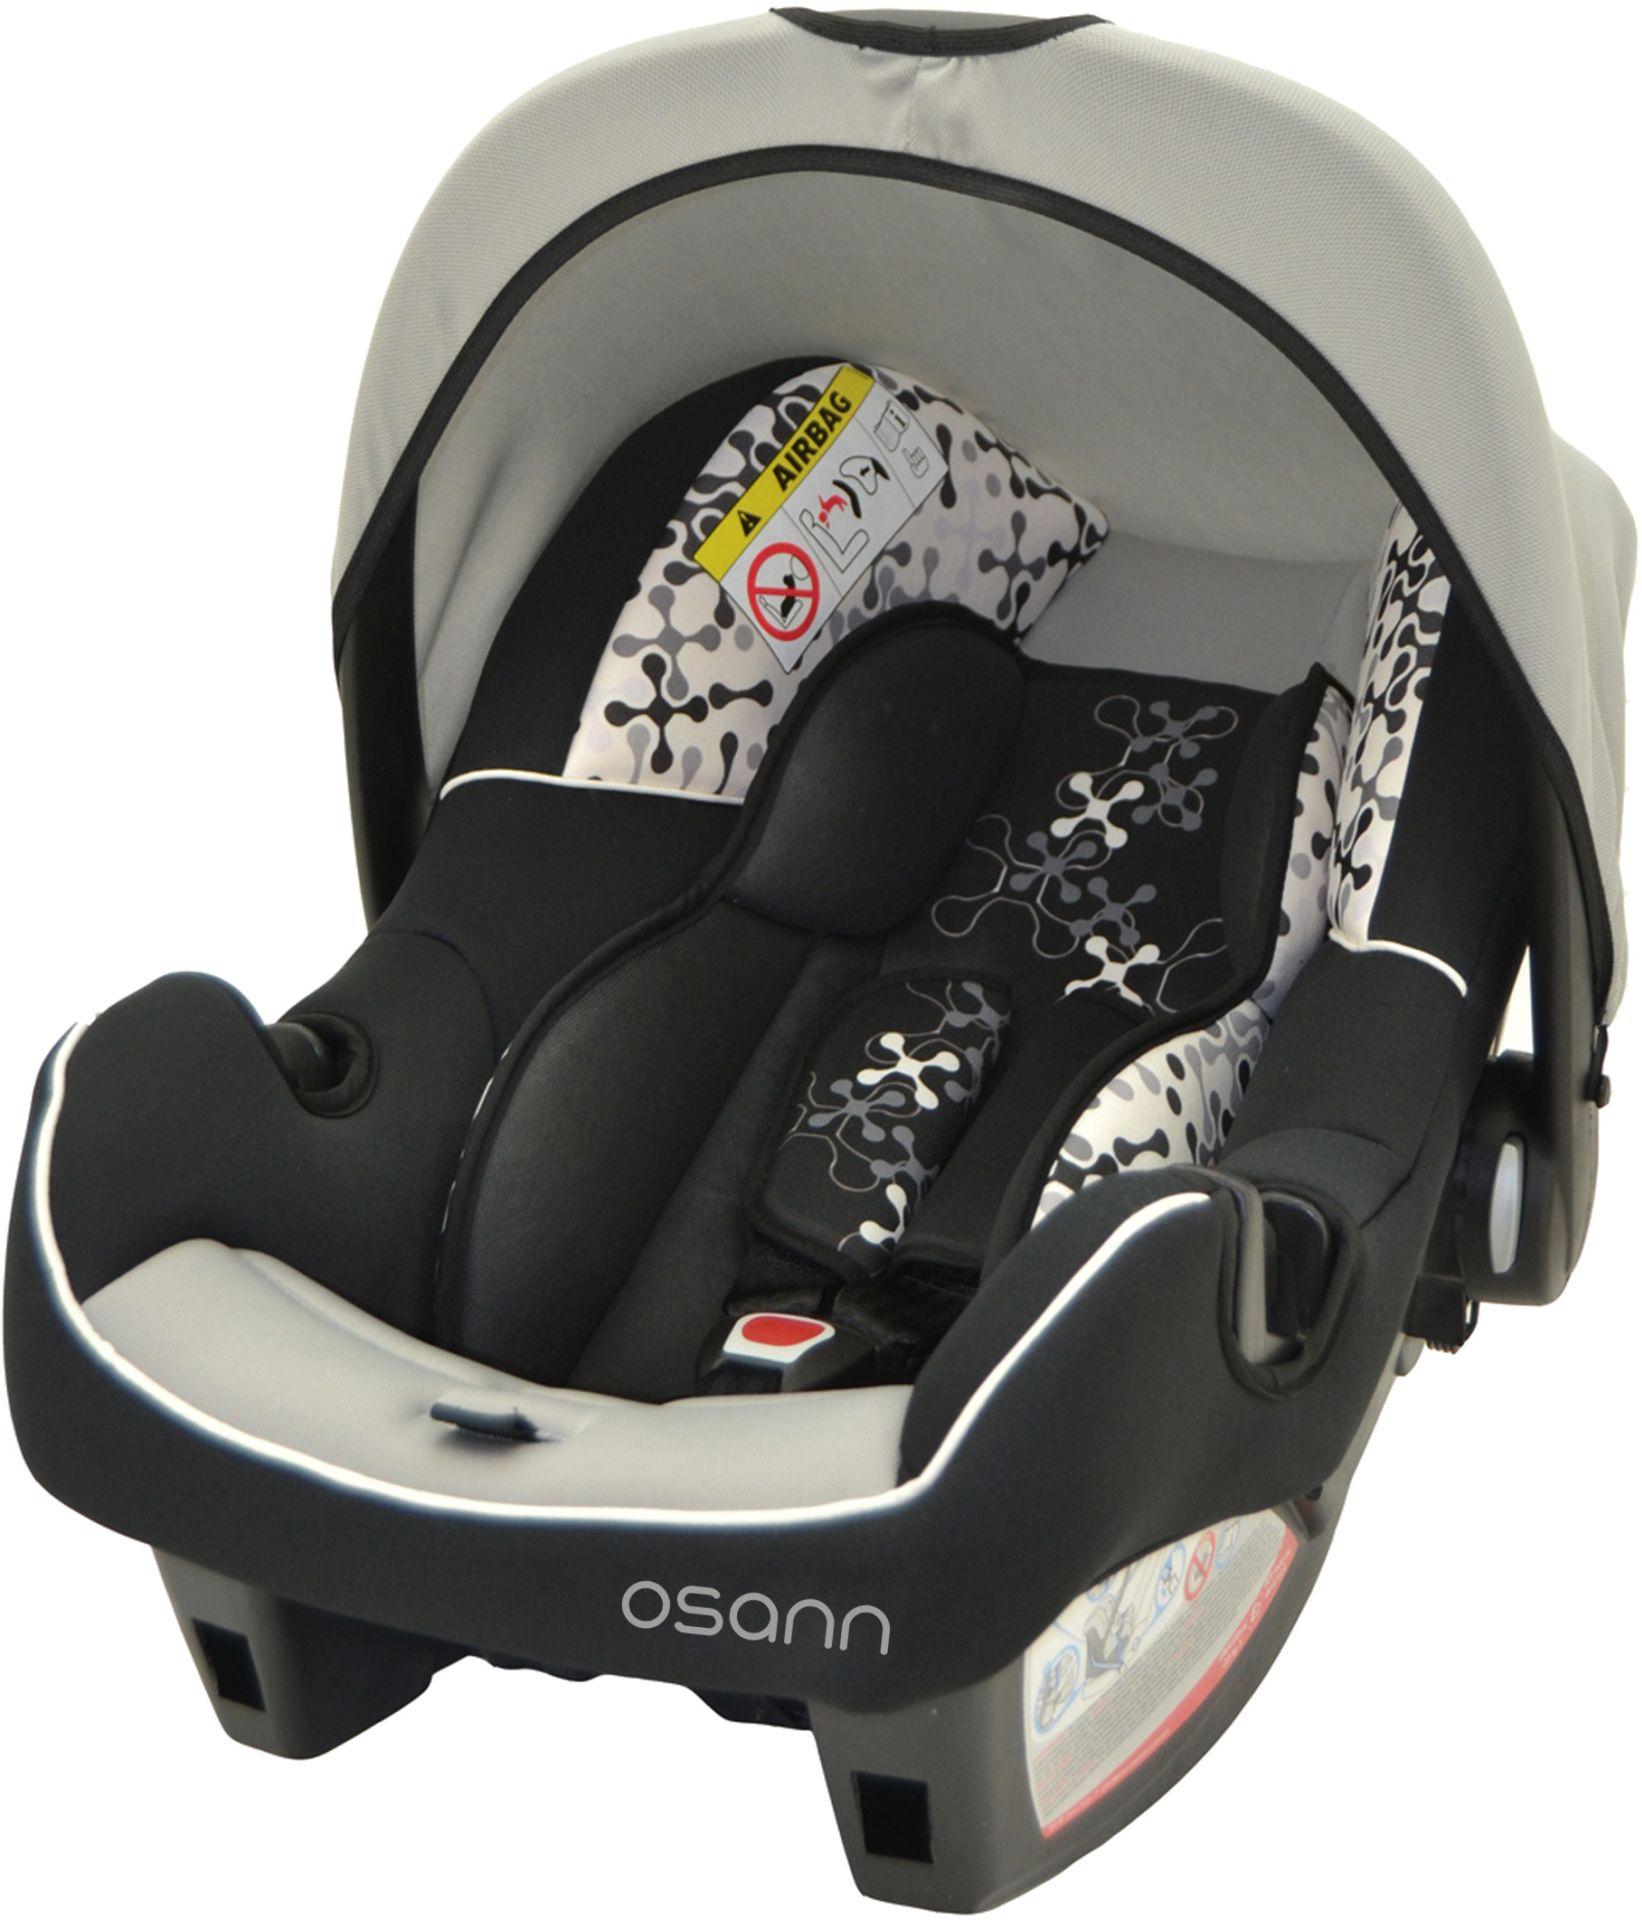 osann baby car seat beone sp 2016 black buy at kidsroom car seats. Black Bedroom Furniture Sets. Home Design Ideas